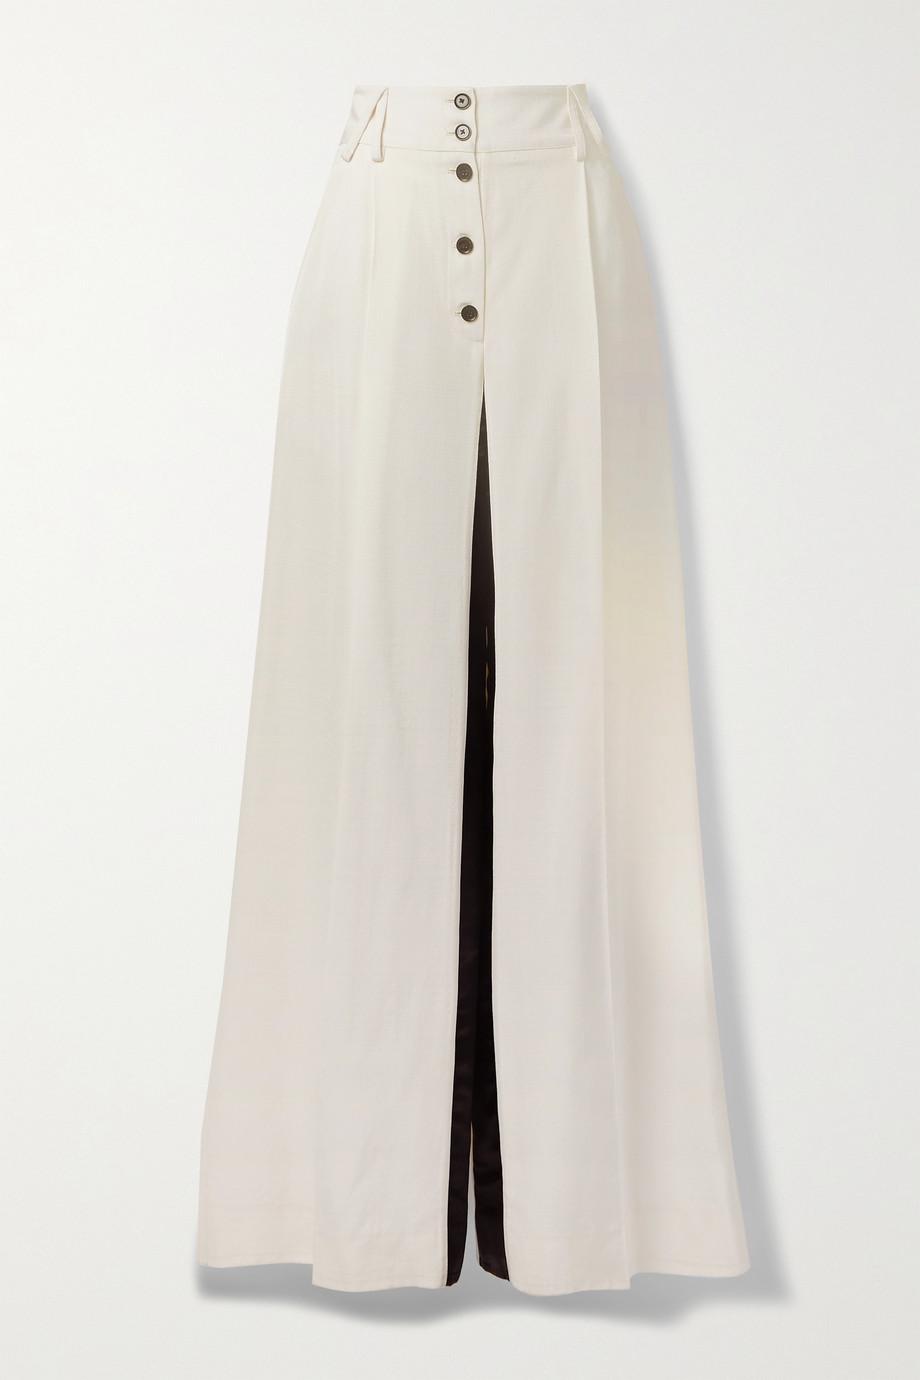 Proenza Schouler Two-tone satin-trimmed woven wide-leg pants